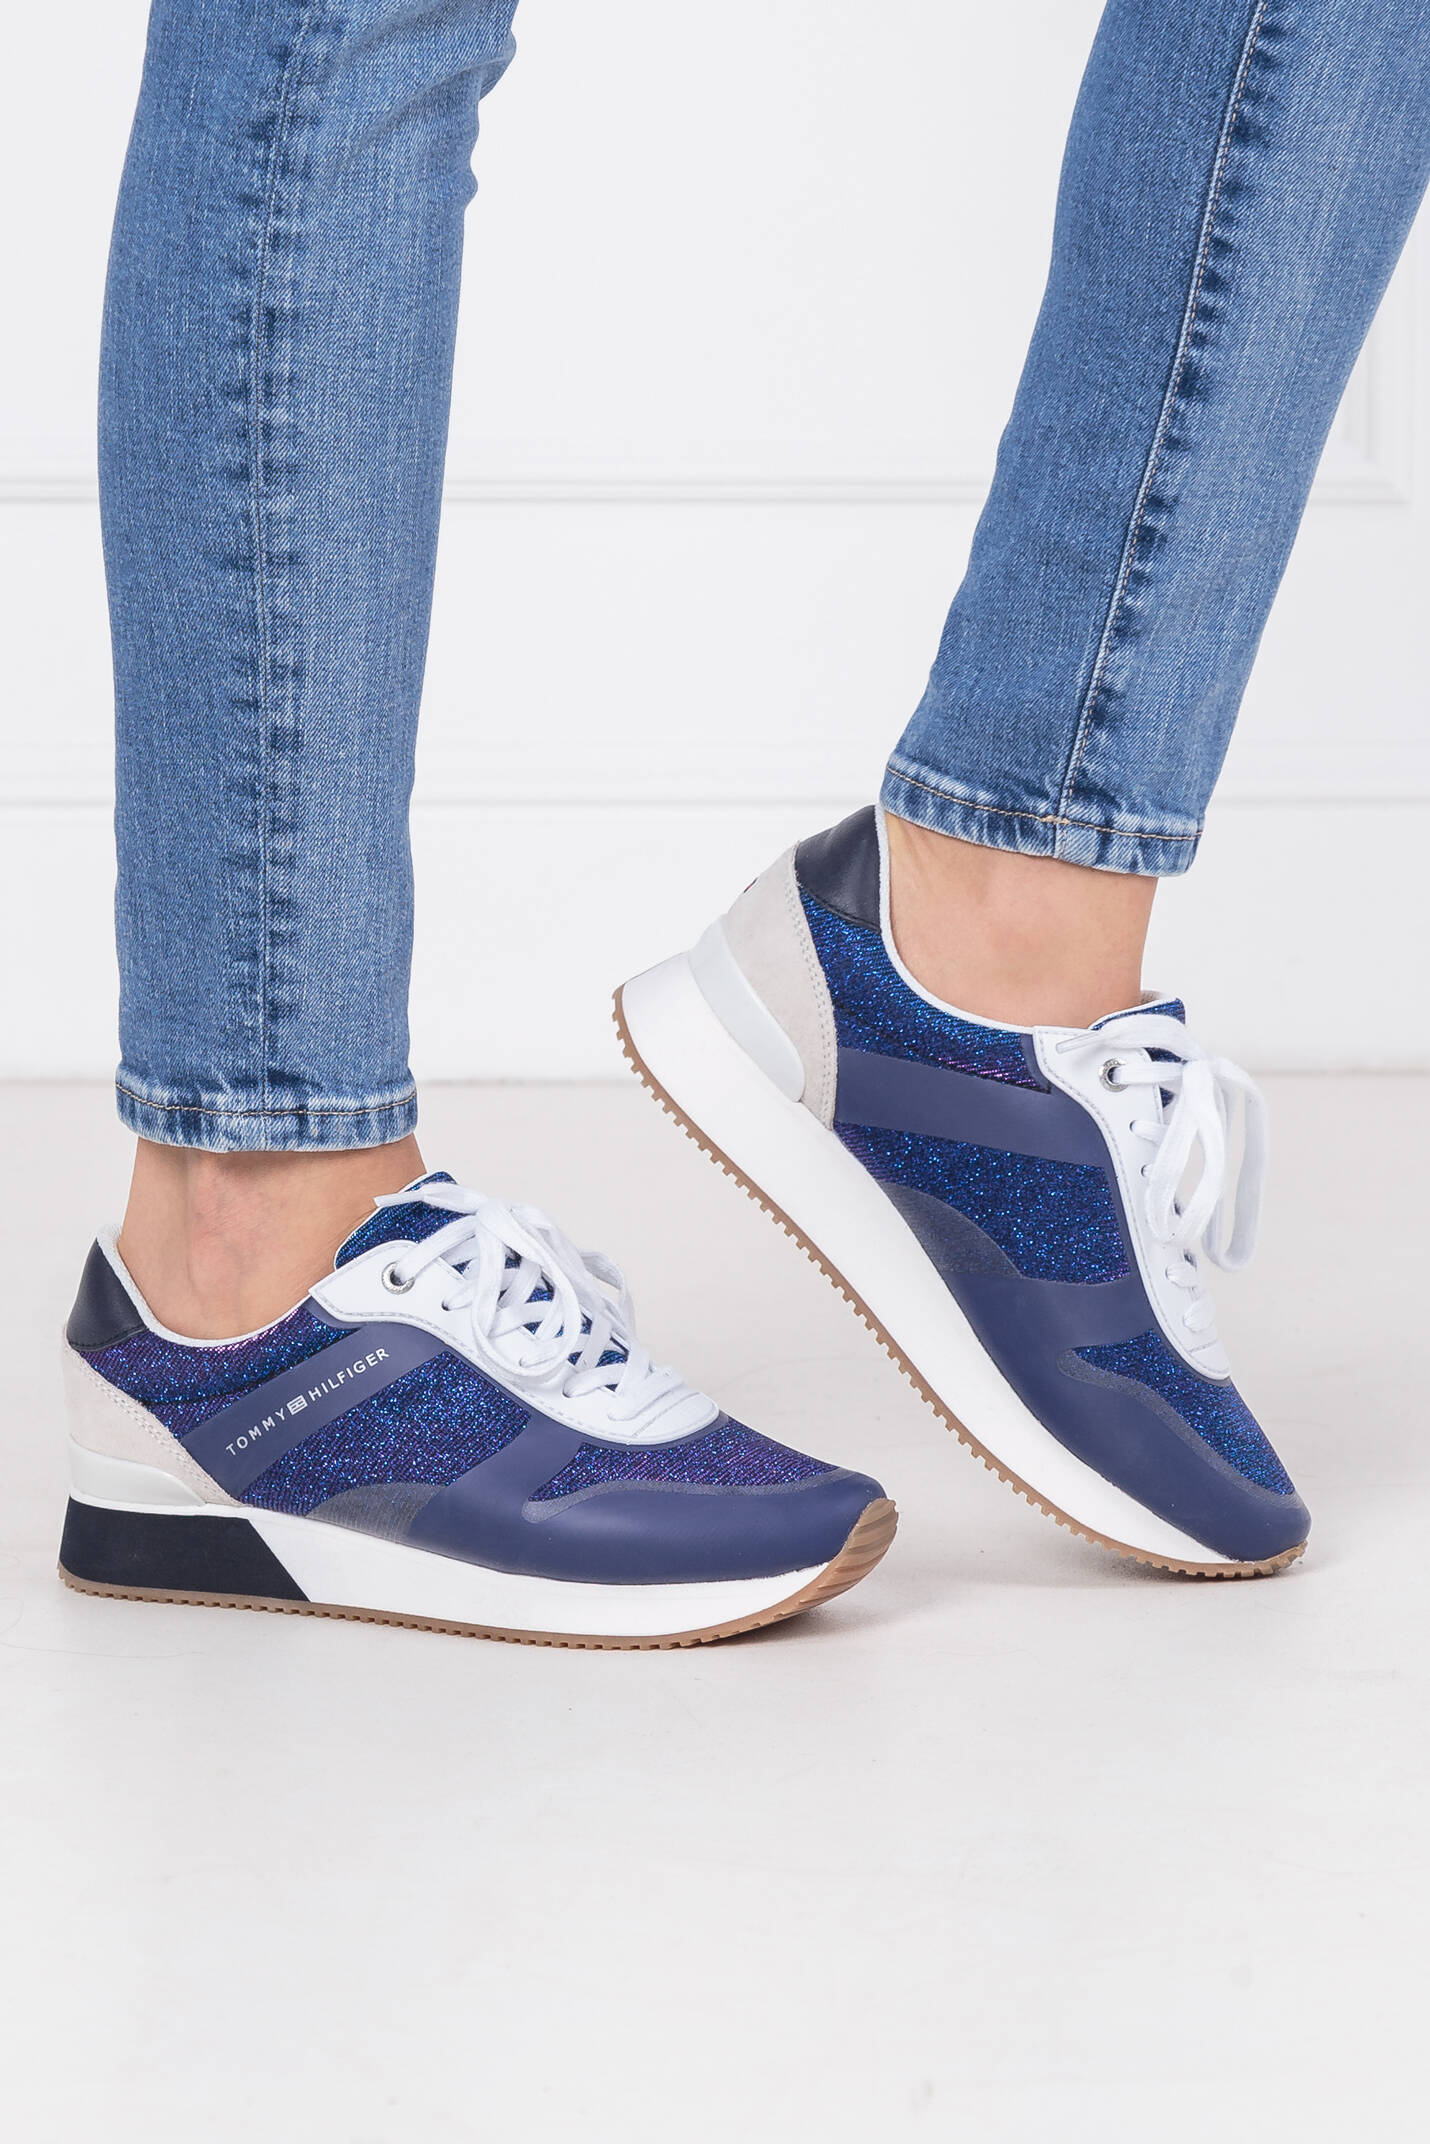 aef1f509608cb Sneakers GLITTER CITY Tommy Hilfiger | Navy blue | Gomez.pl/en